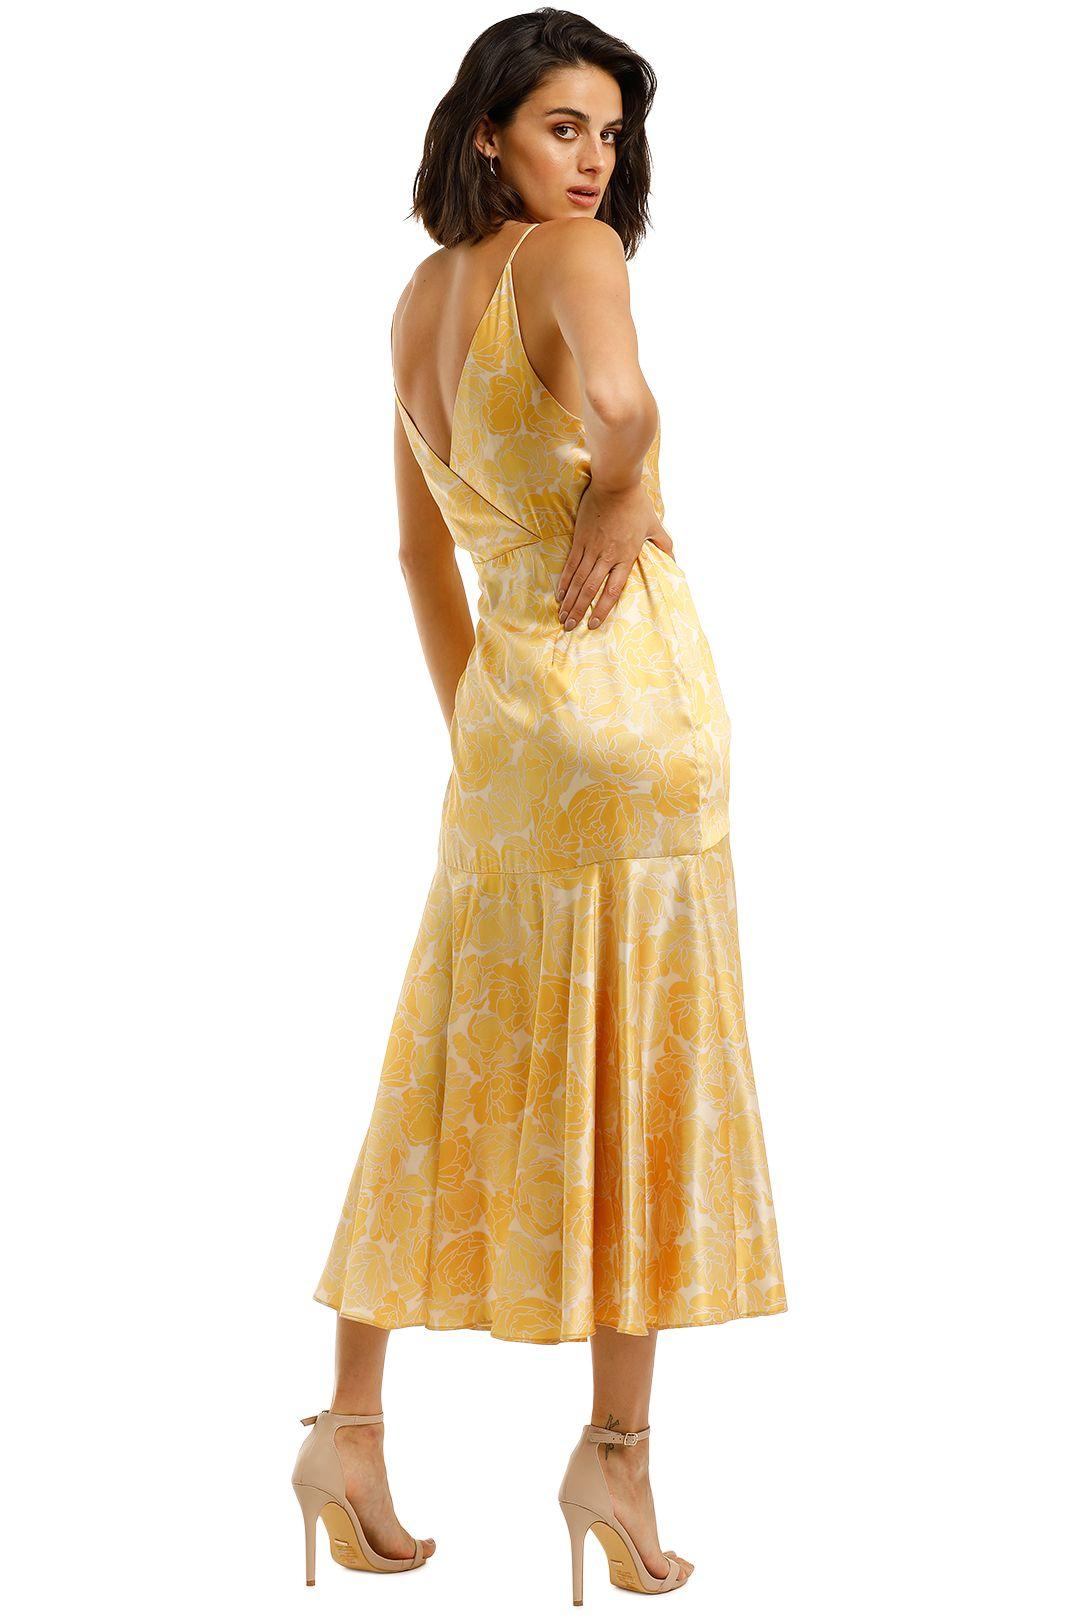 Acler-Dana-Wrap-Dress-Lemon-Back